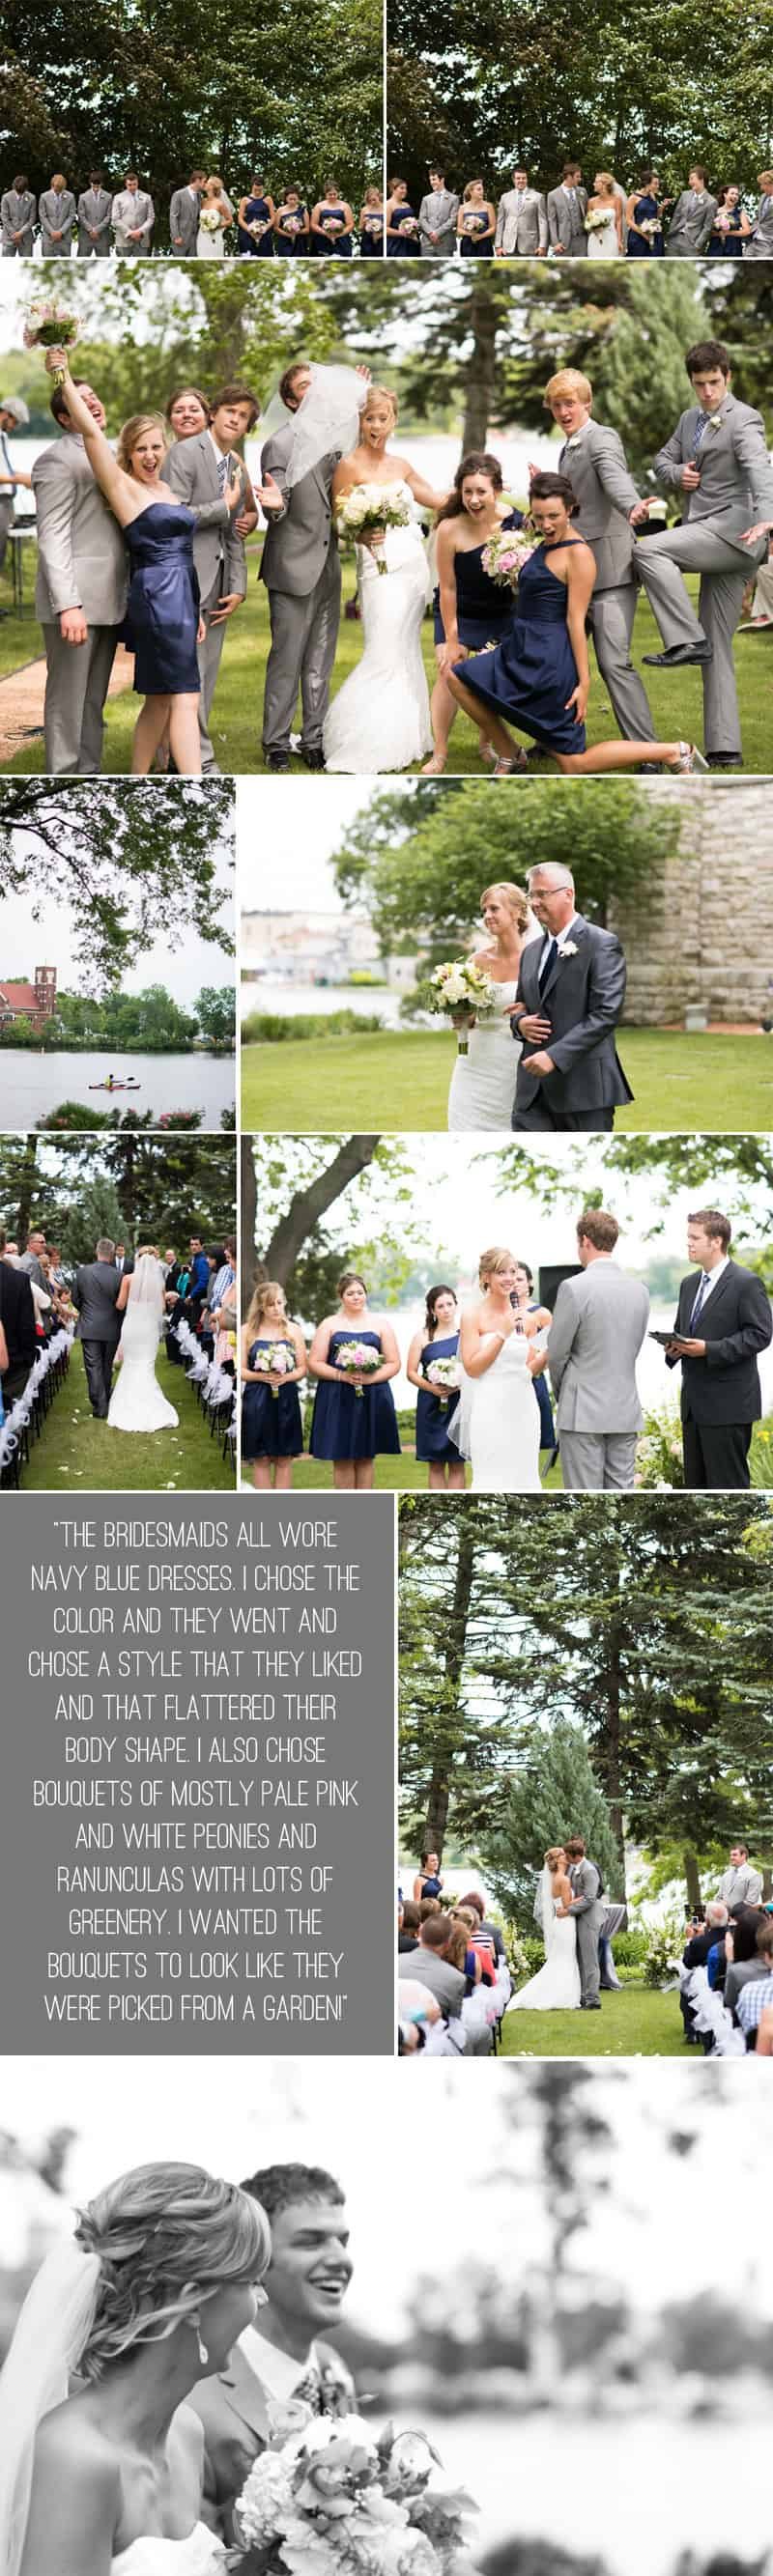 Outdoor Garden Wedding 3